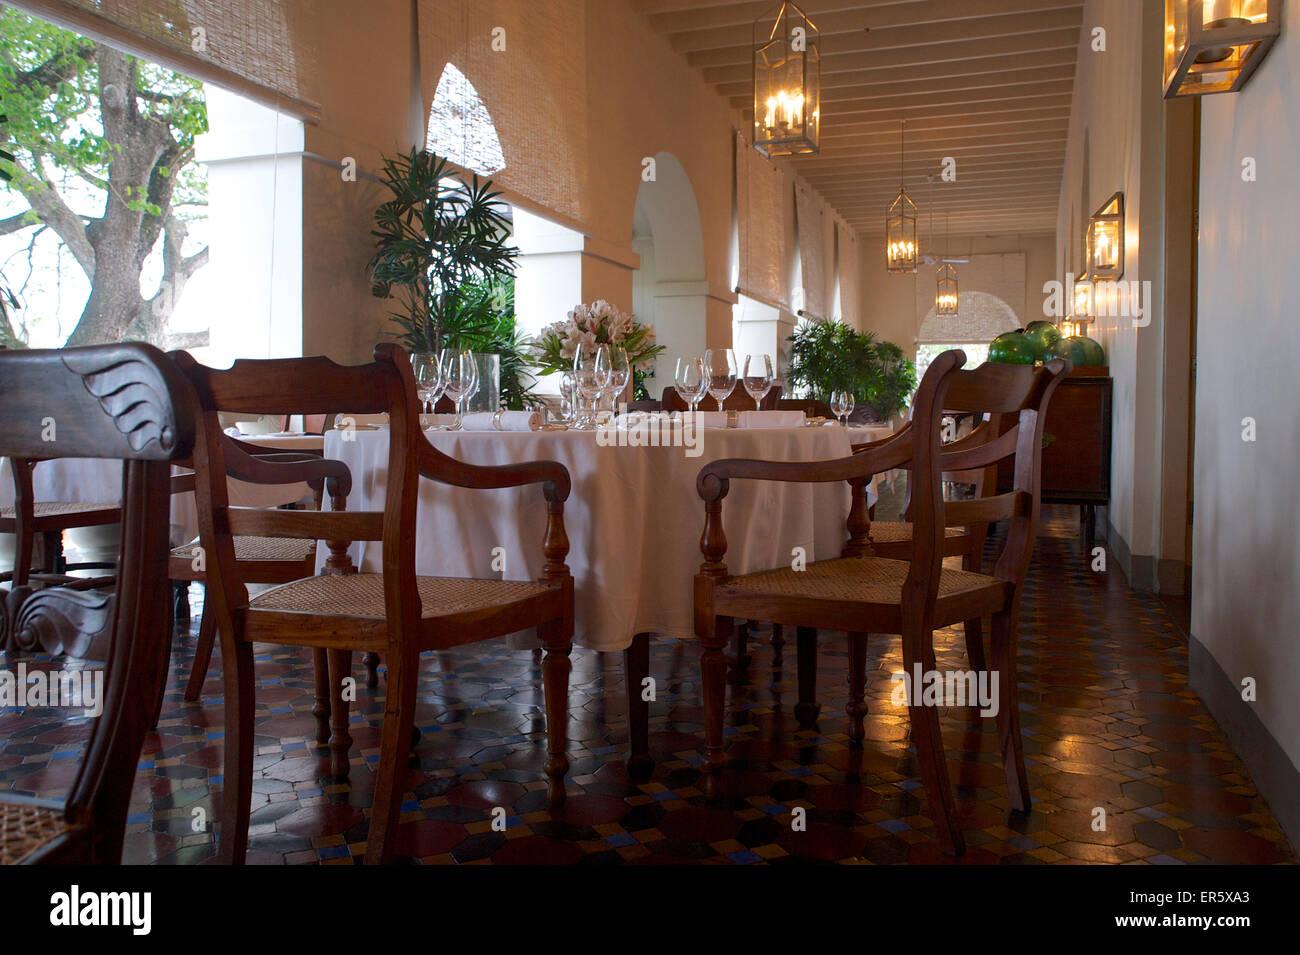 Dining Table On The Veranda Of The Luxury 5 Star Hotel Amangalle, Galle,  Southwest Coast, Sri Lanka